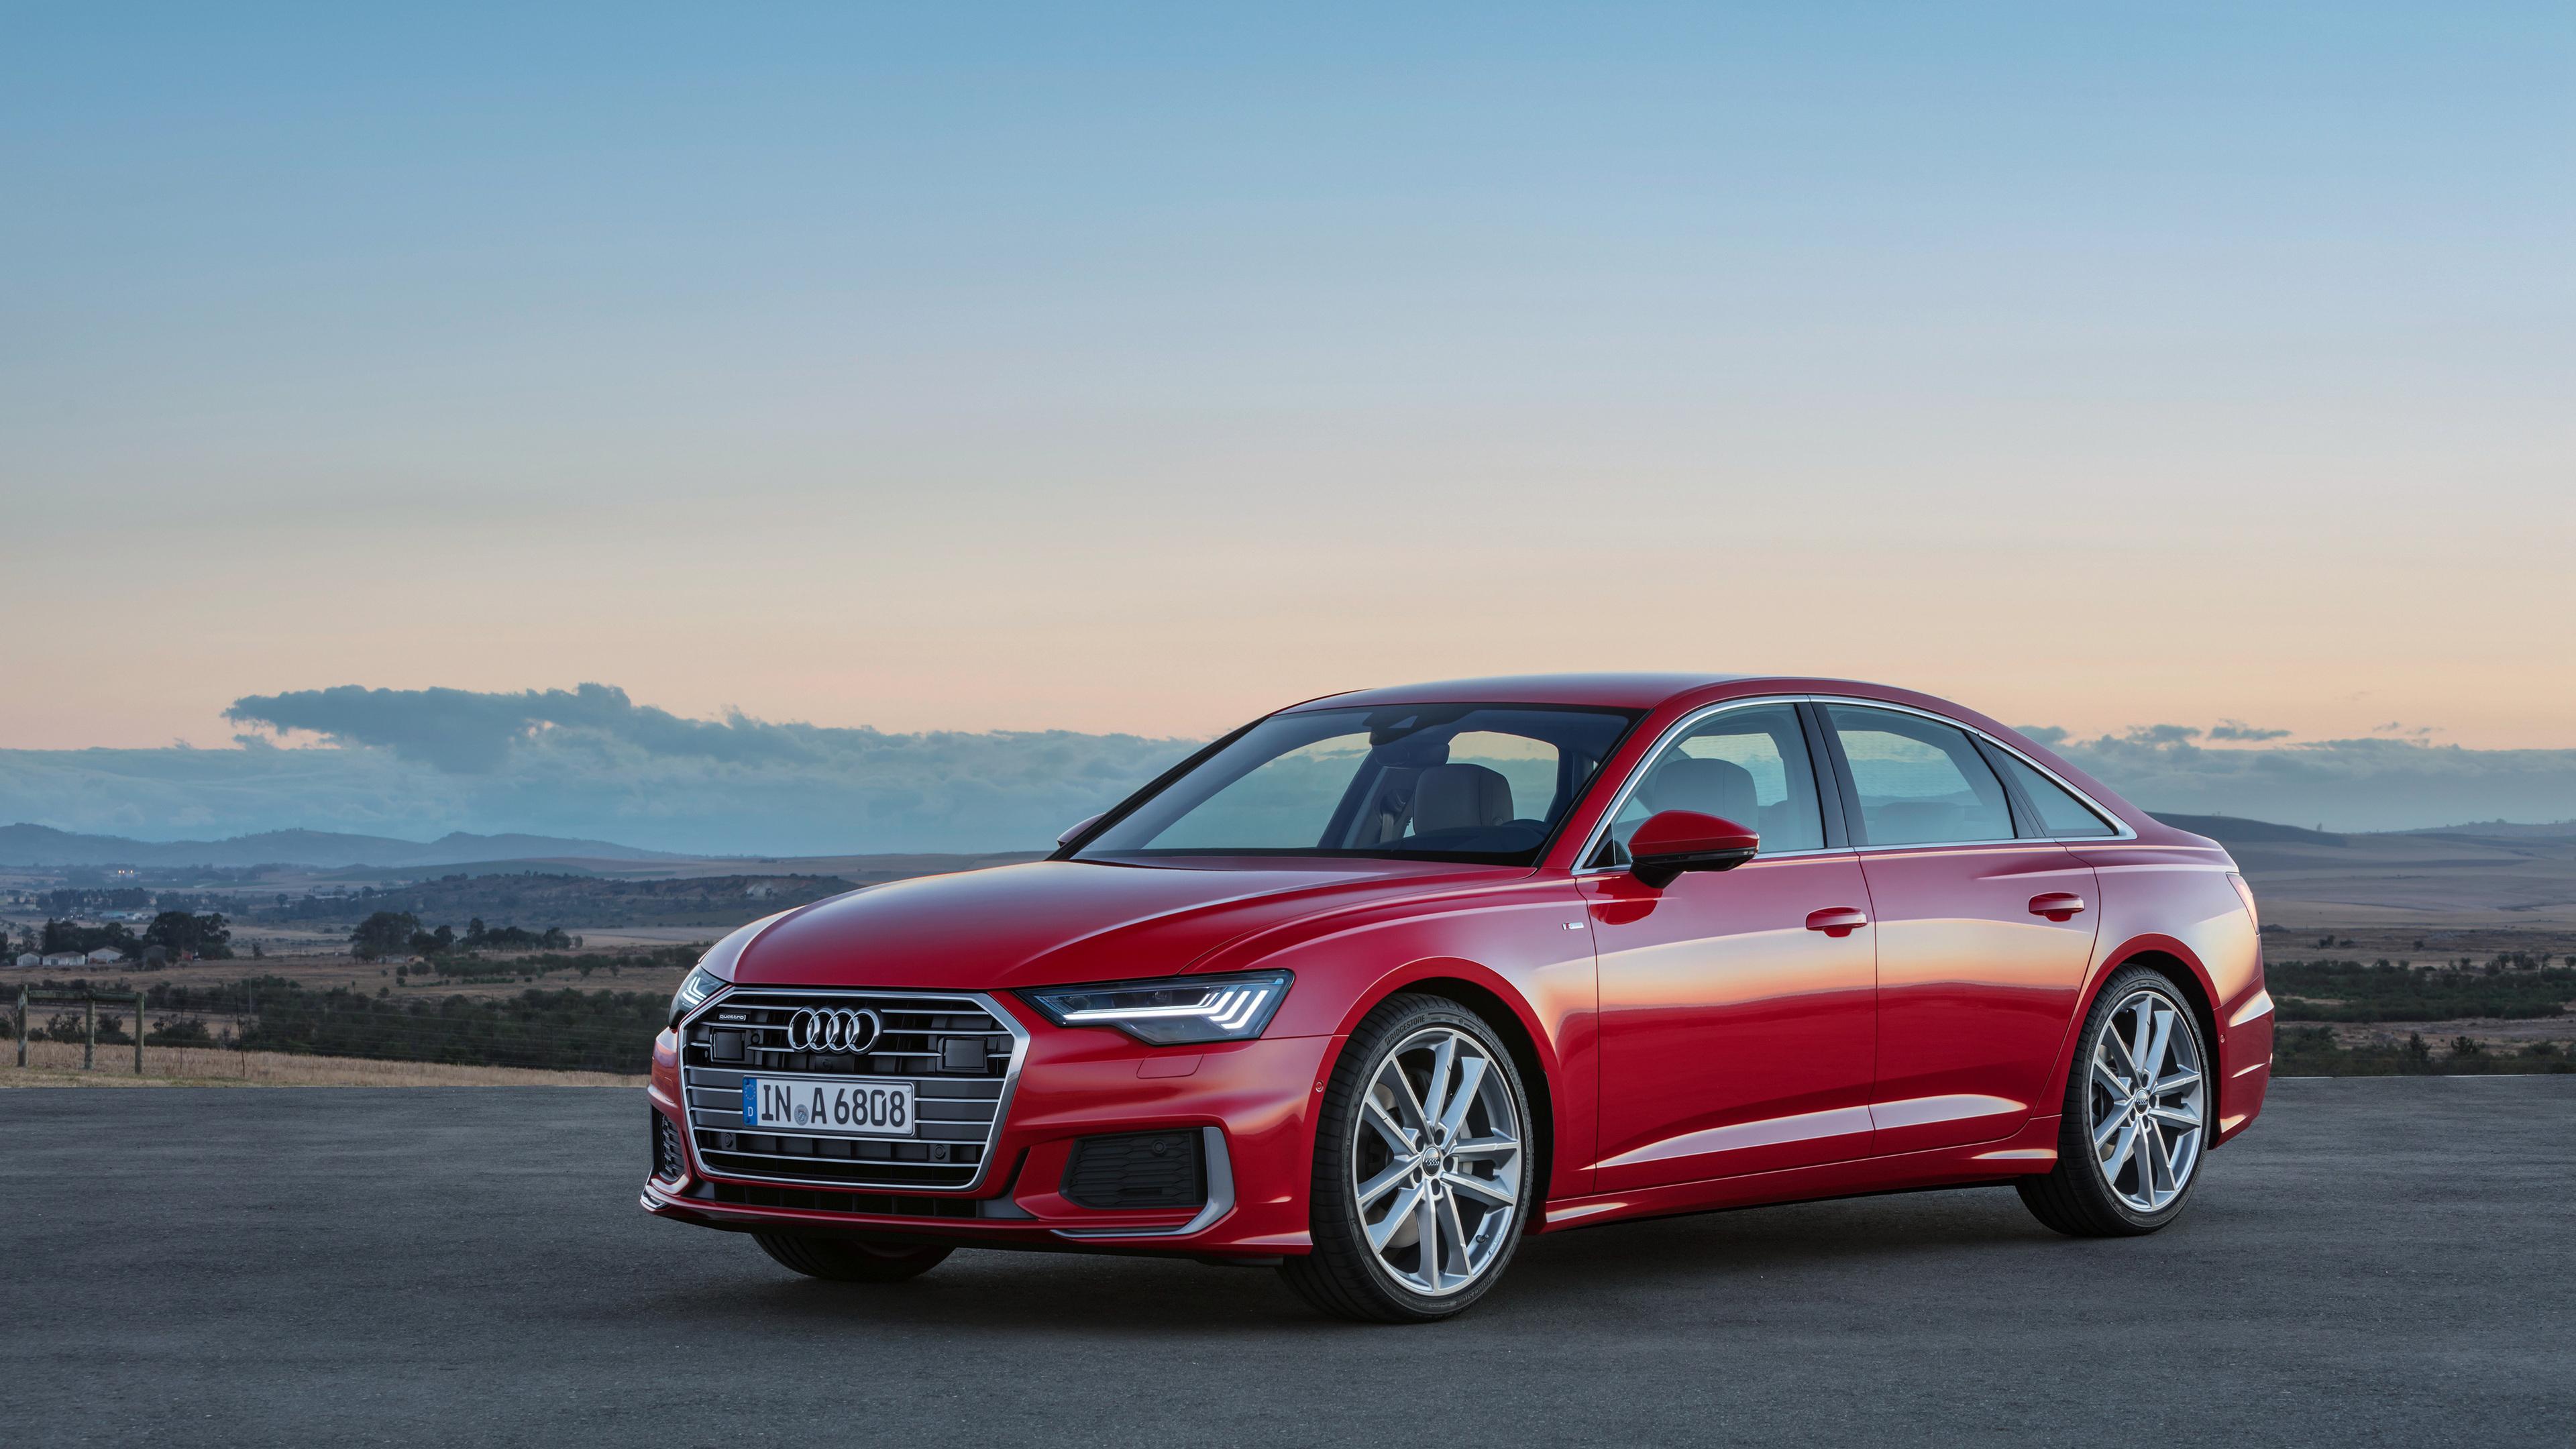 K Audi A on audi s4, audi a11, audi a2, audi logo, audi a9, audi aa, audi x6, audi a1, audi r6,